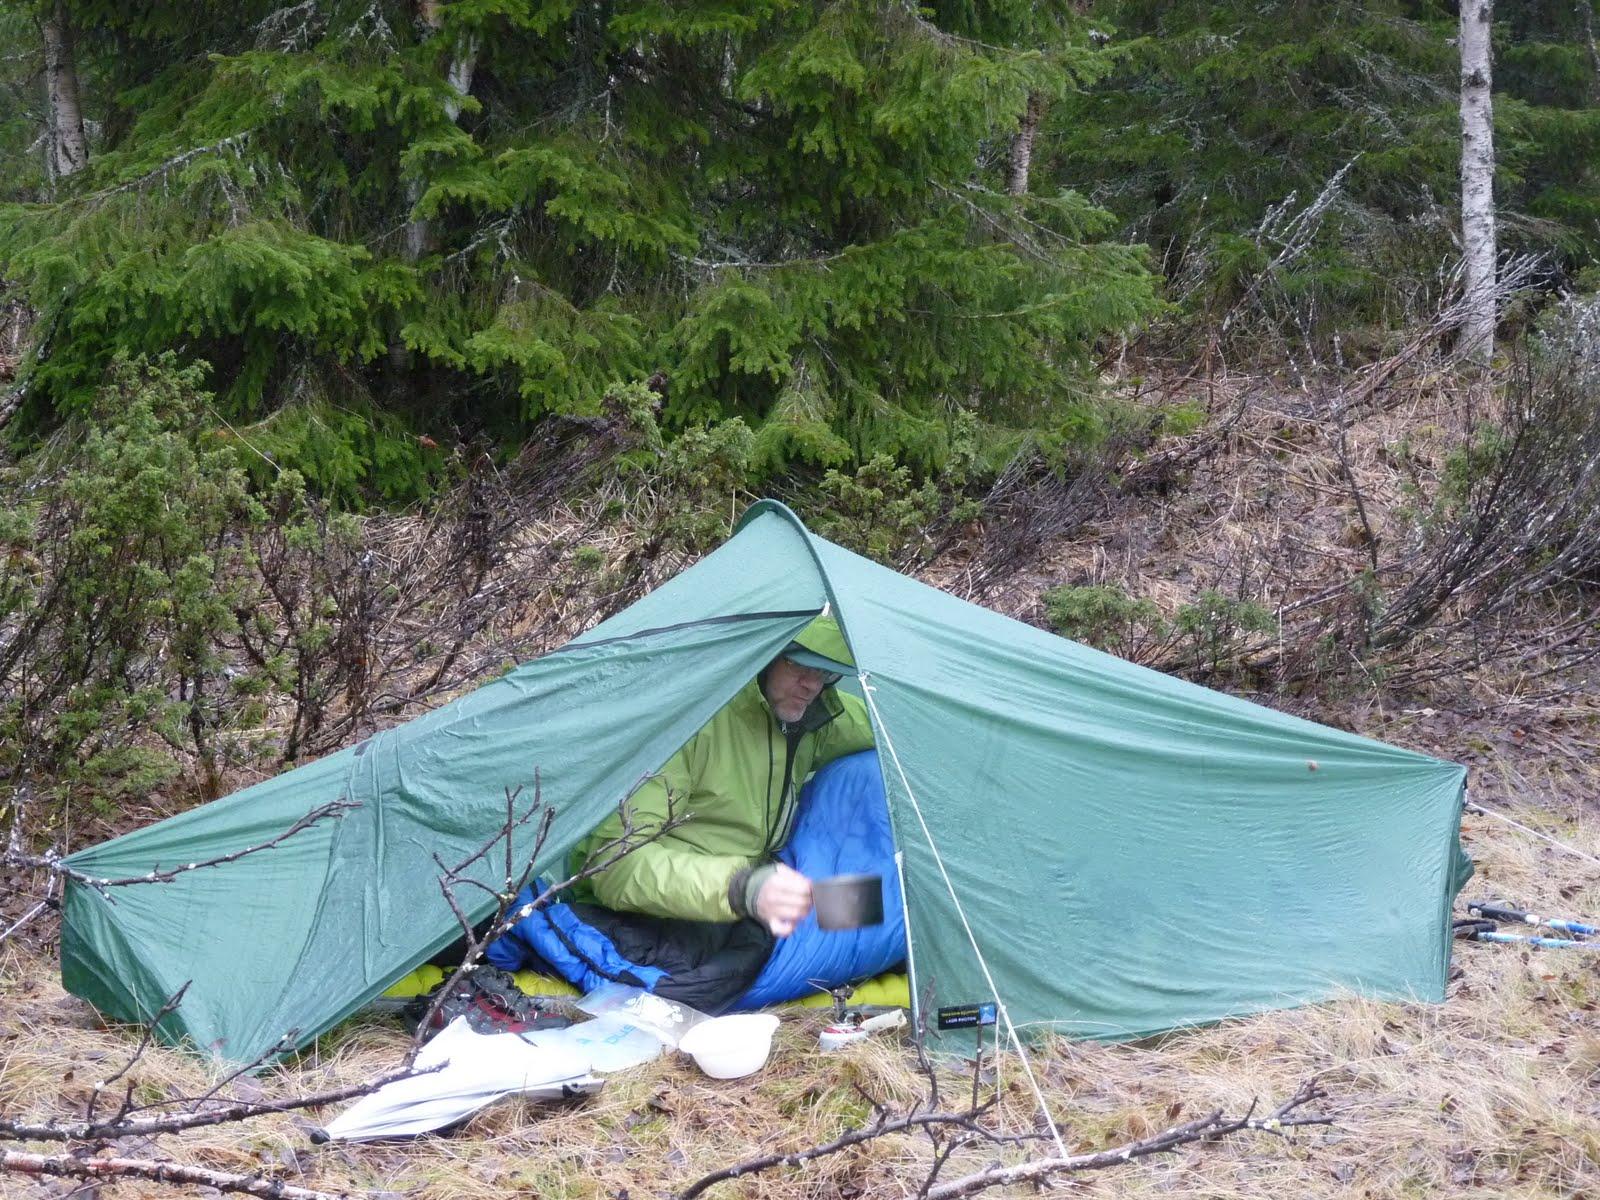 Using the tent as a tarp. Wet breakfast in Vålådalen. & TN Laser Photon - light and not half bad